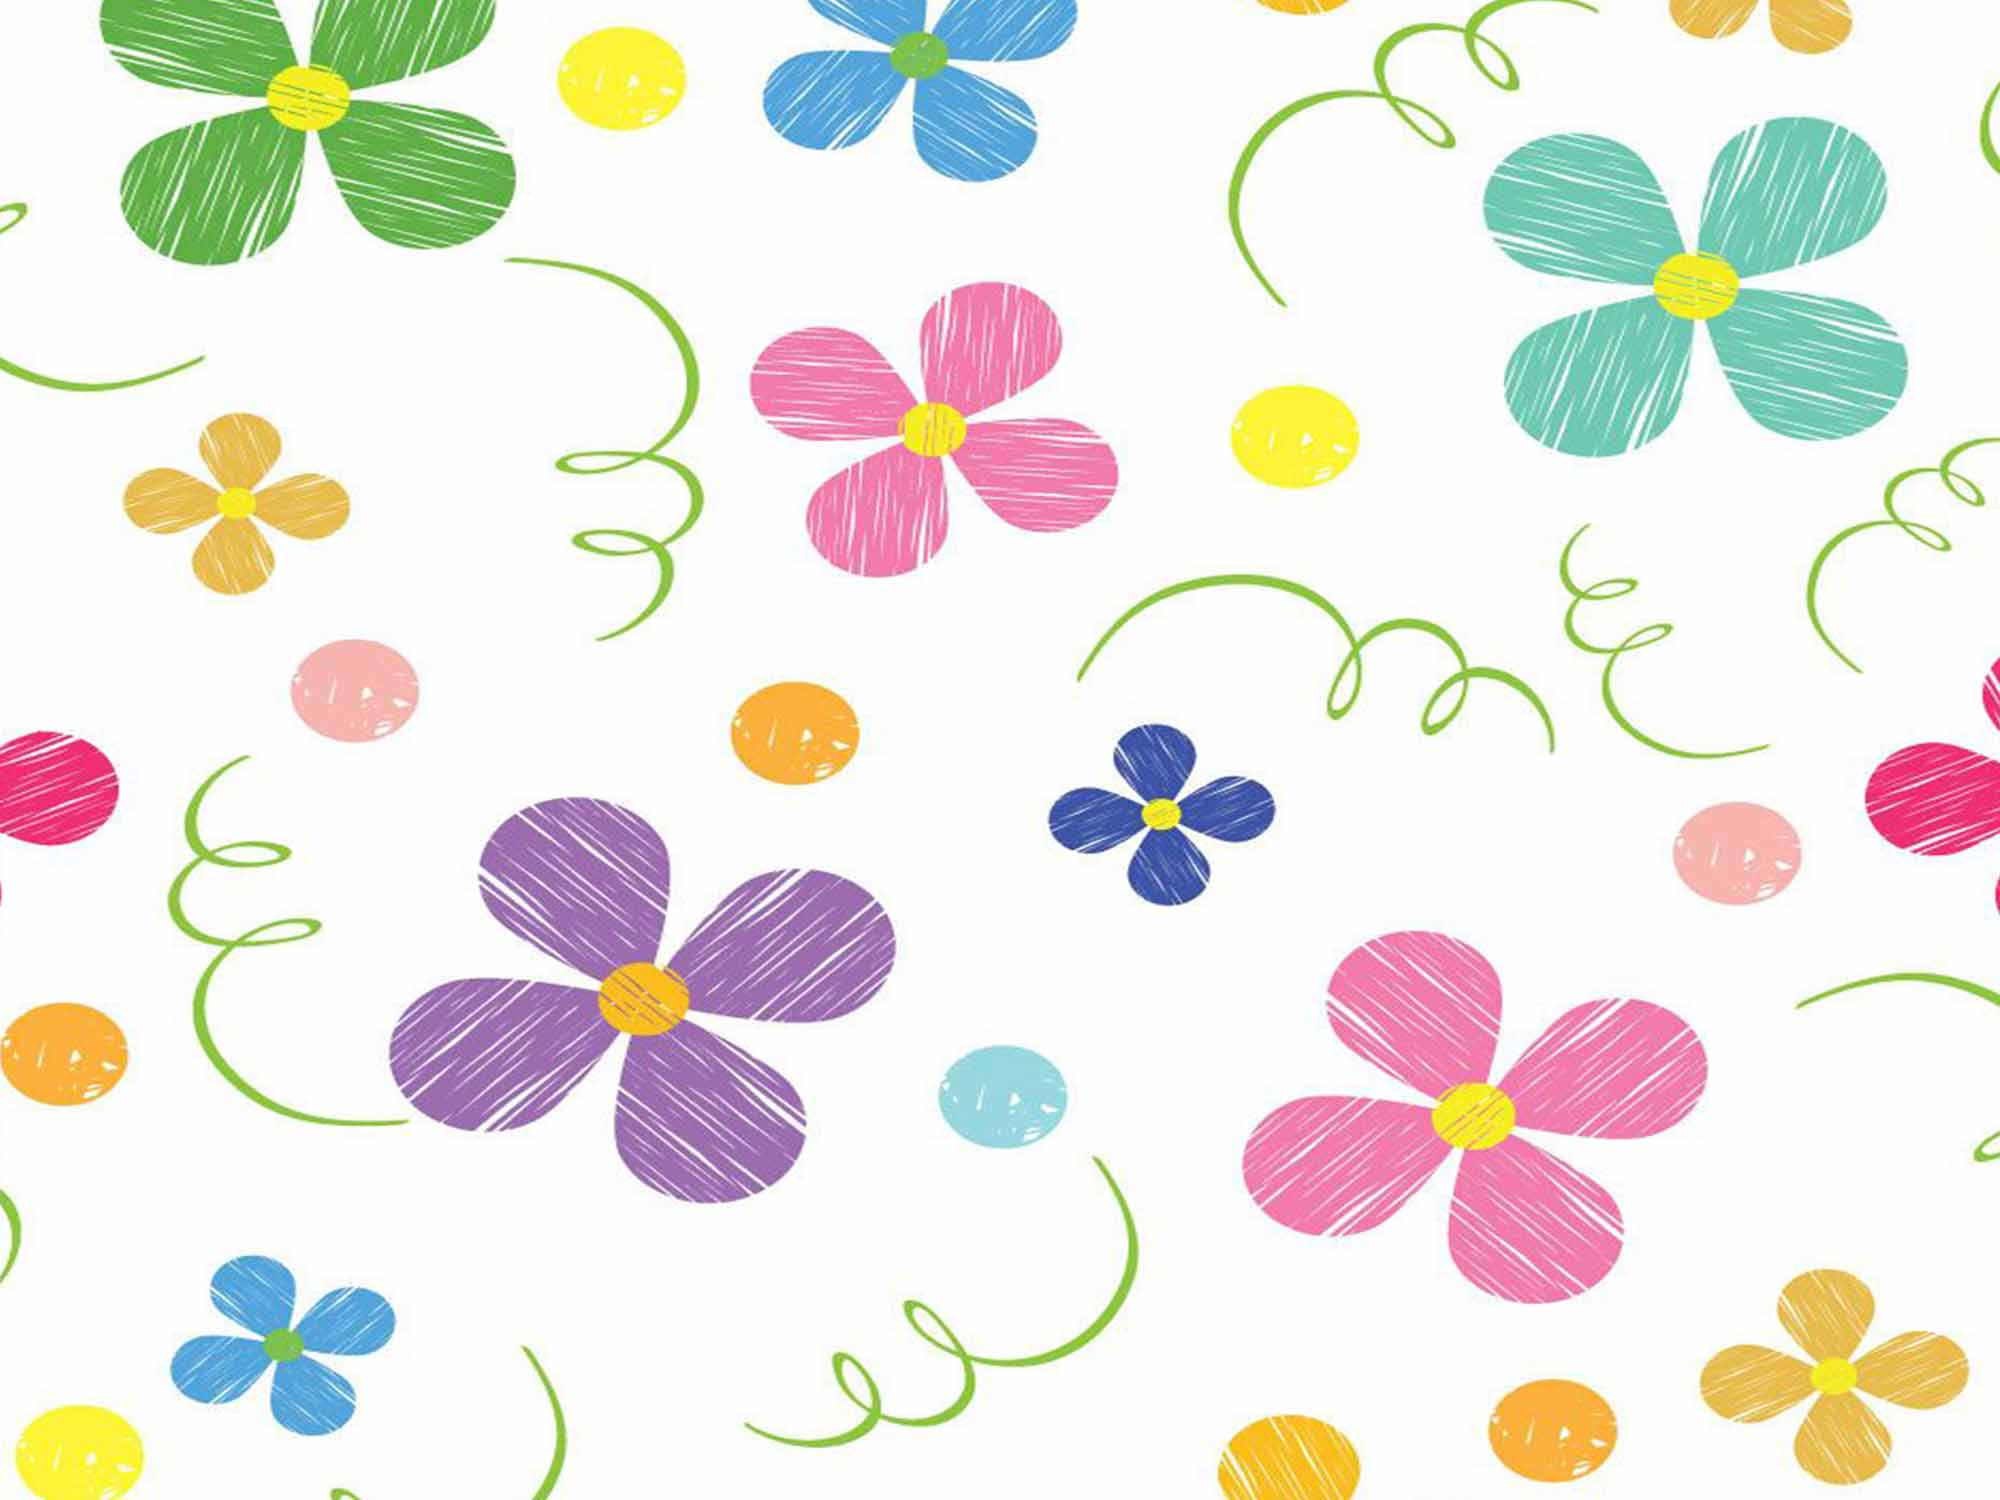 Papel de Parede Floral 0067 - Adesivos de Parede  - Paredes Decoradas